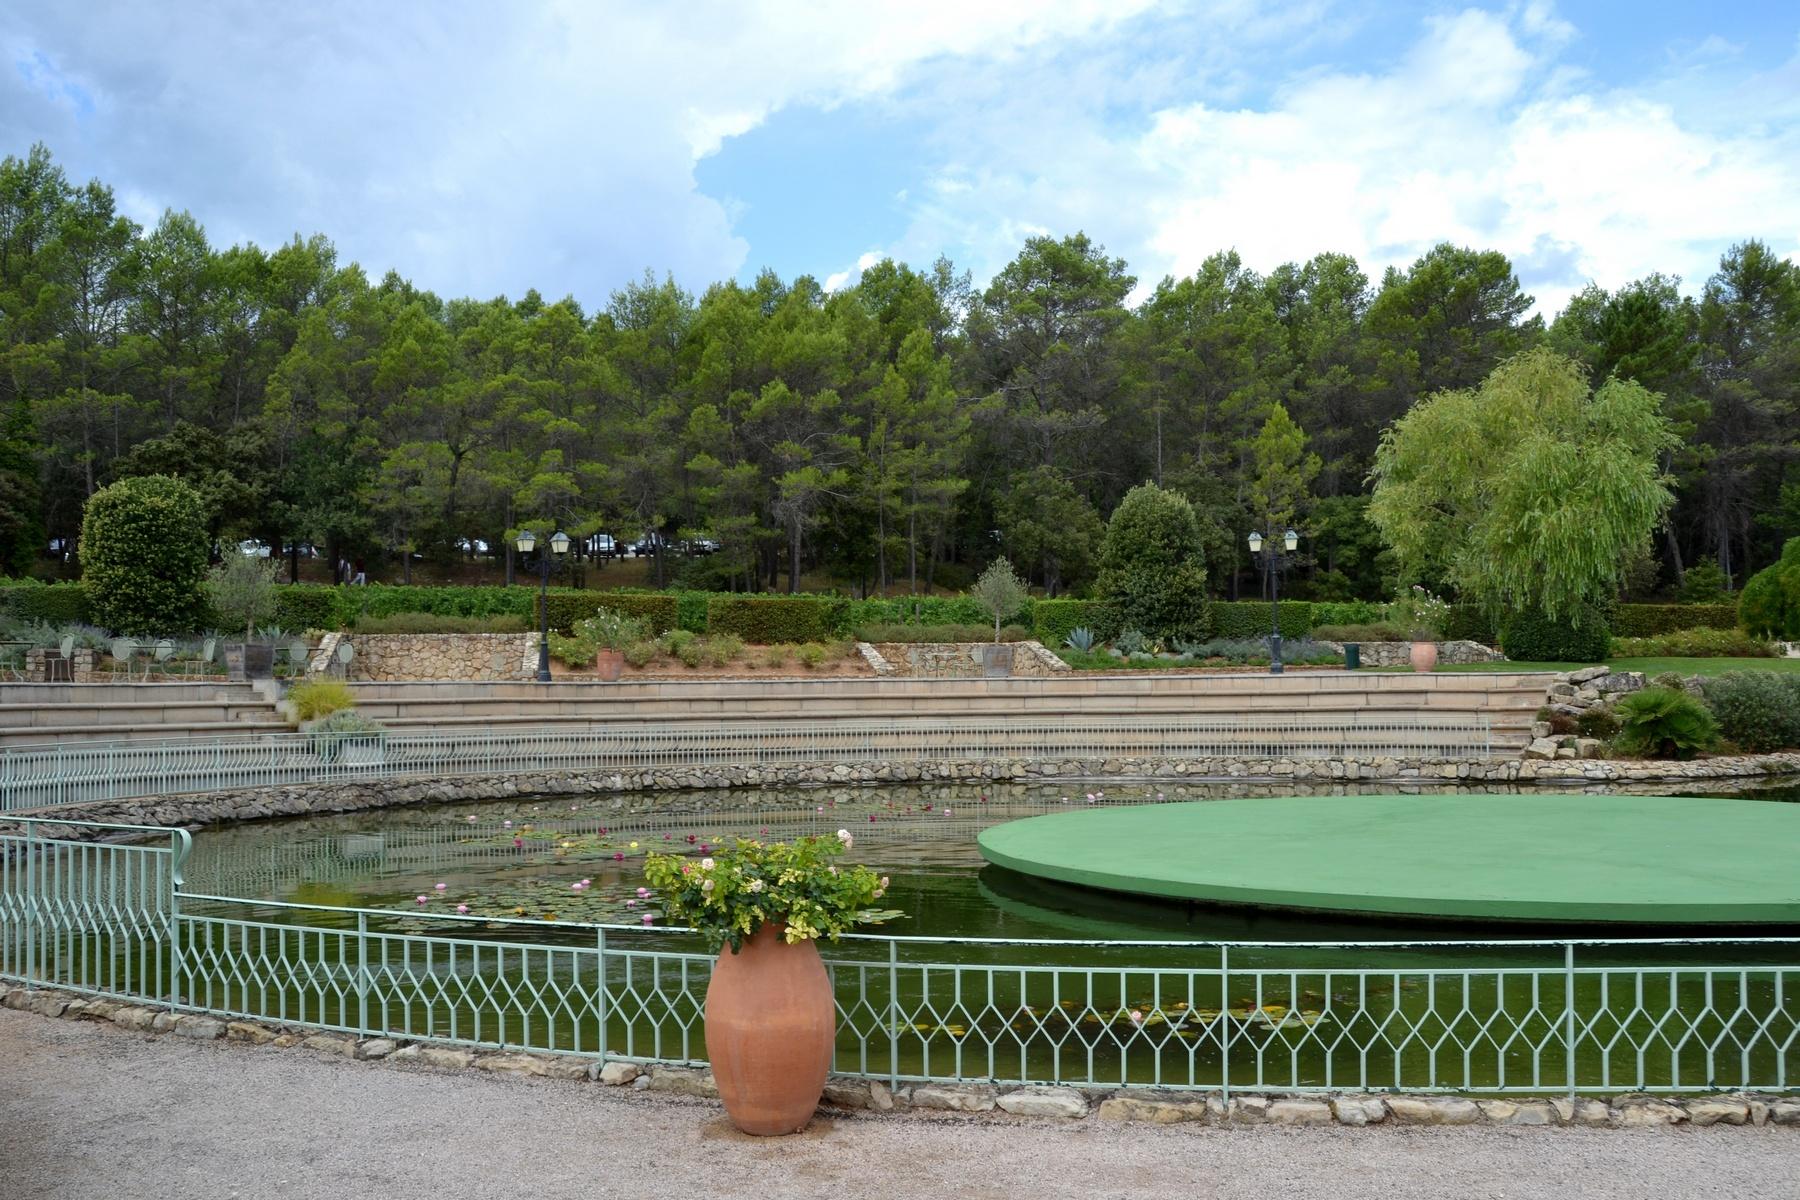 Chateau De Berne Flayosc (Draguignan)